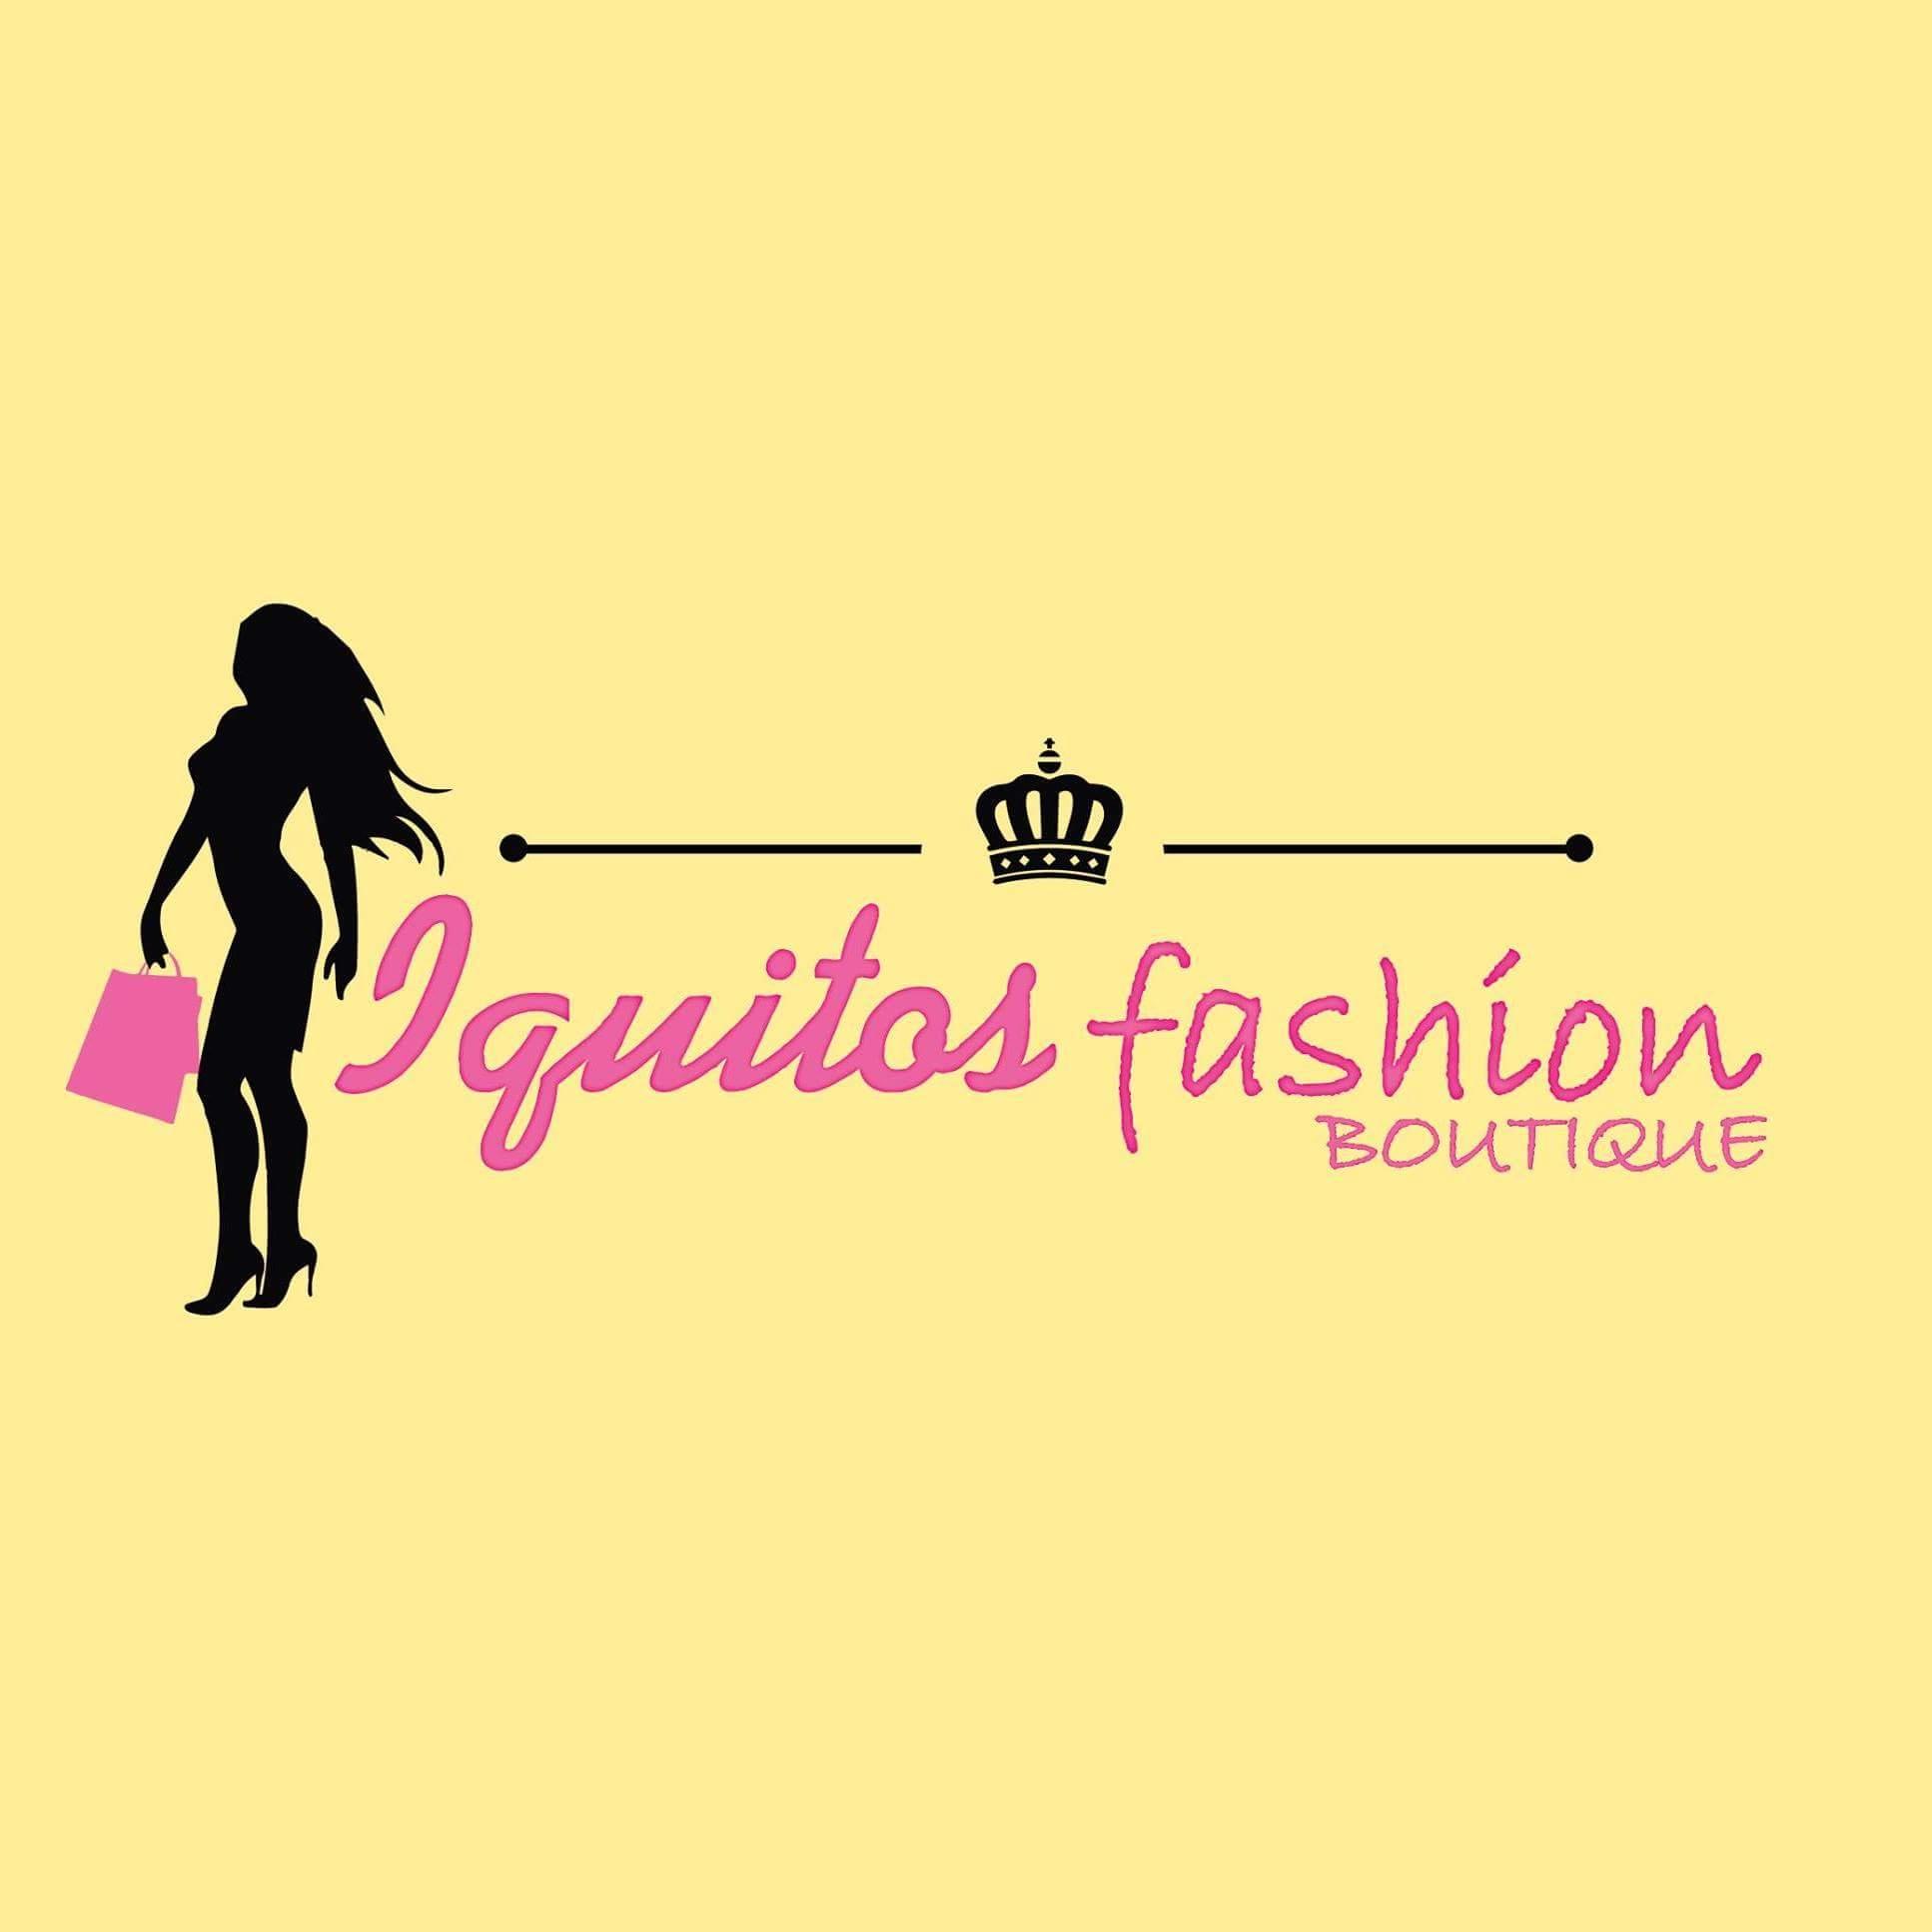 Iquitos Fashion